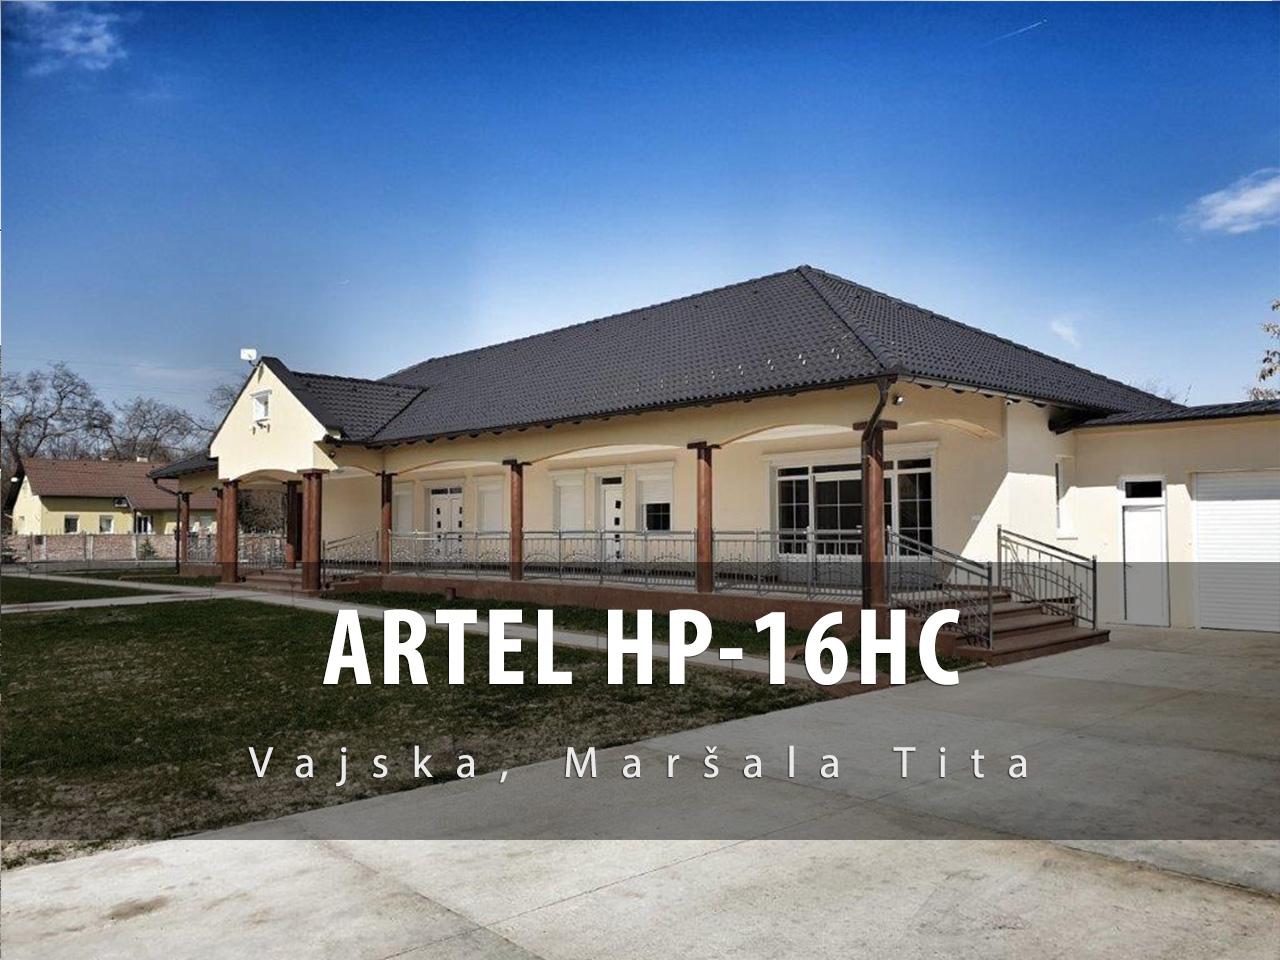 Vajska-Marsala-Tita